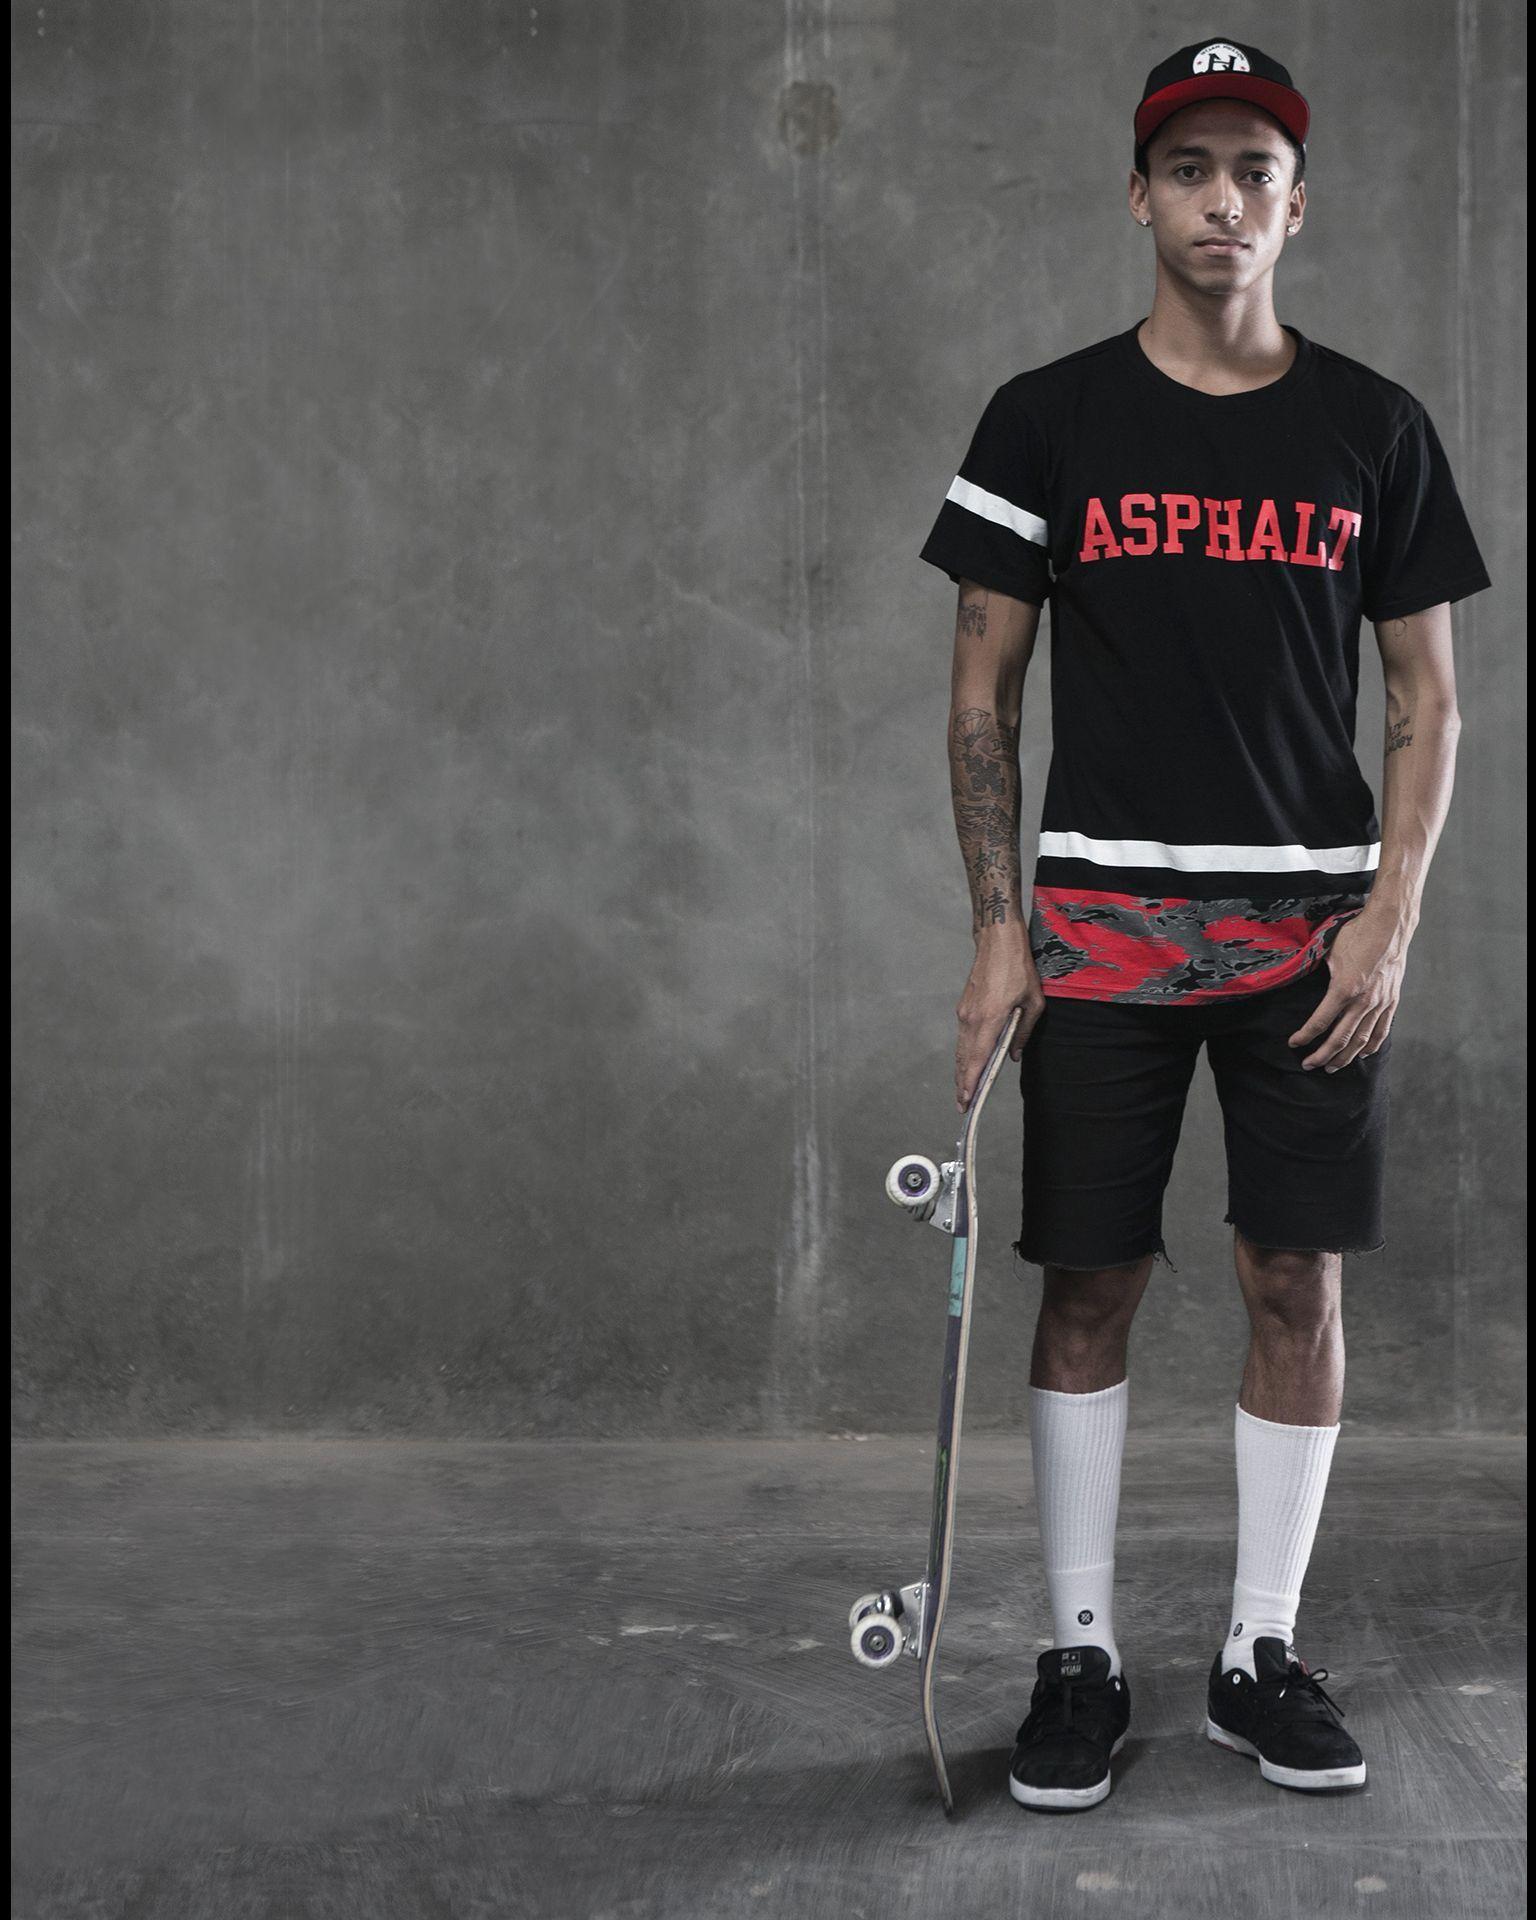 Nyjah huston on street league 2014 sweep new ayc clothing